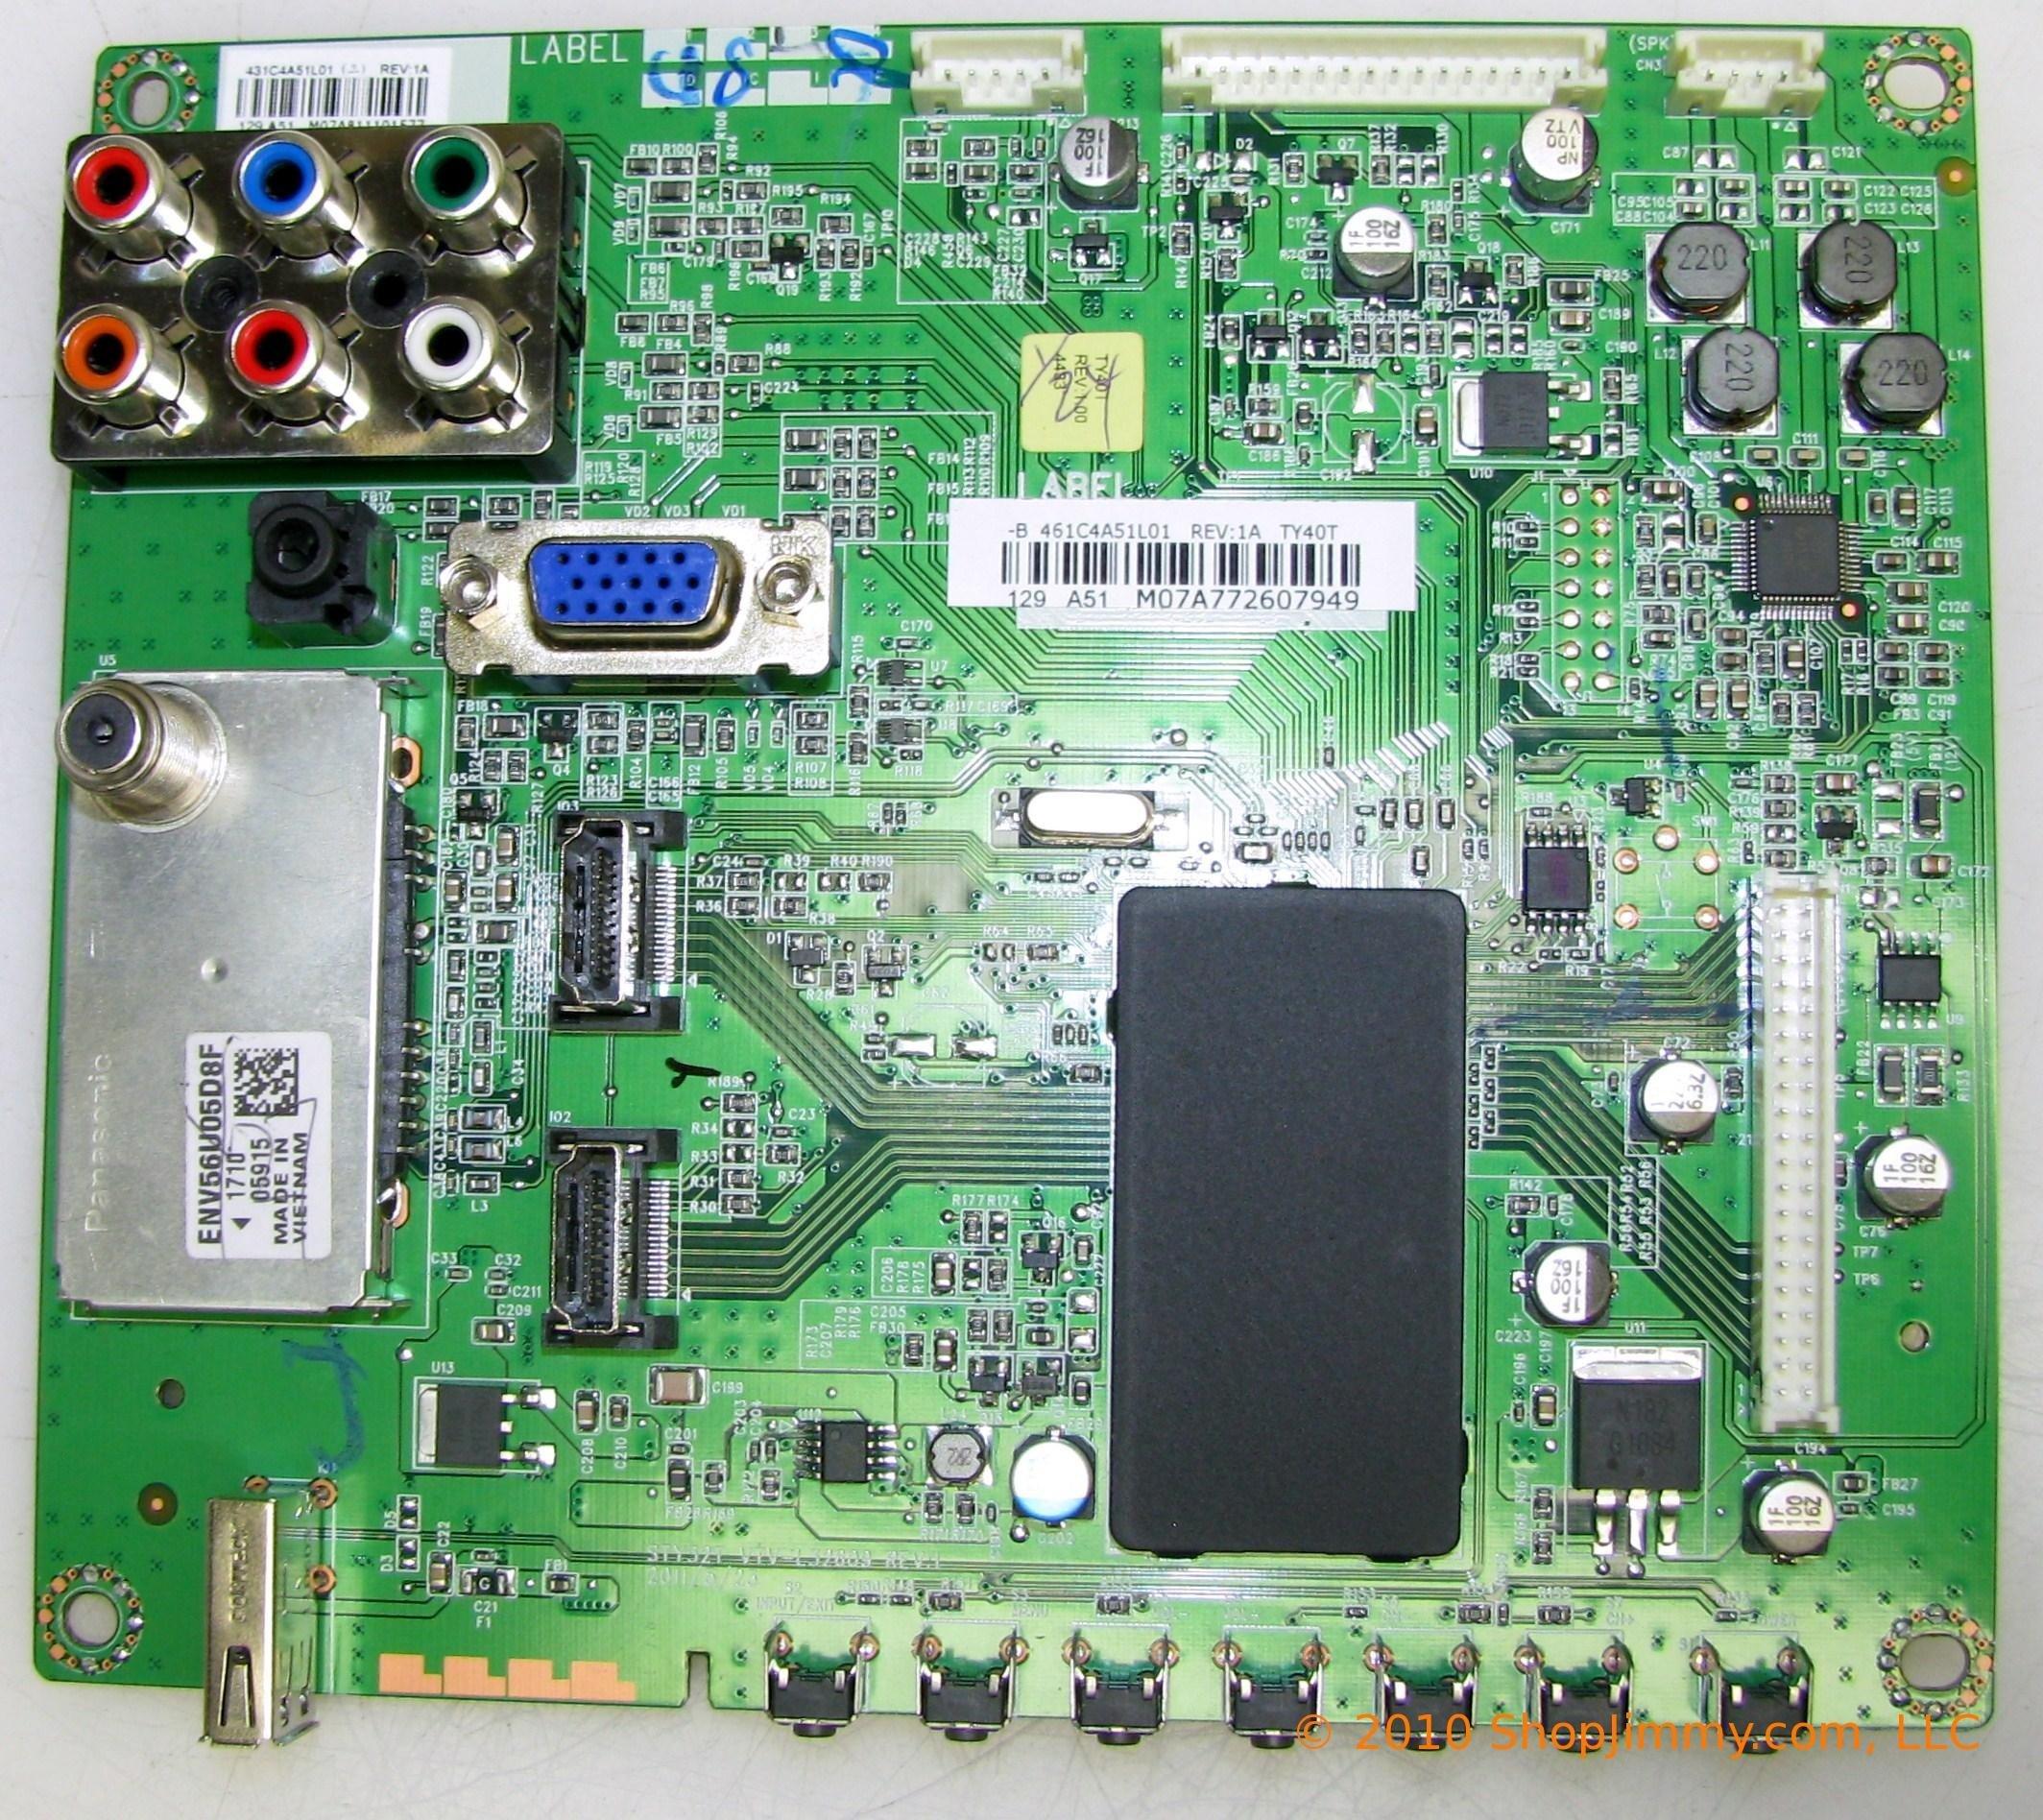 Toshiba 75025867 Main Board for 40FT2U by Toshiba